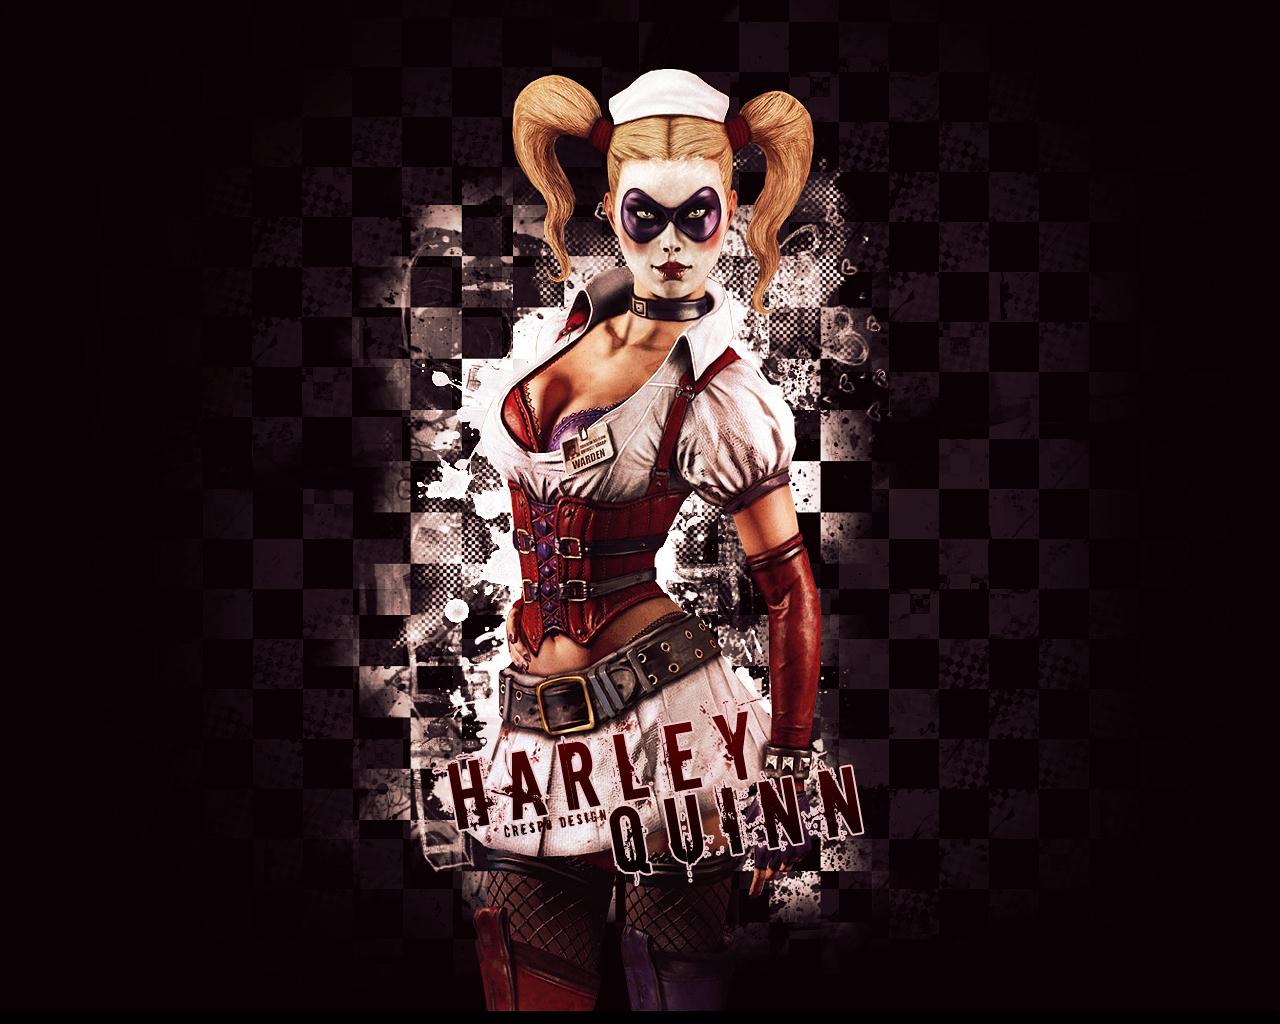 Harley Quinn Computer Wallpapers Desktop Backgrounds 1280x1024 ID 1280x1024